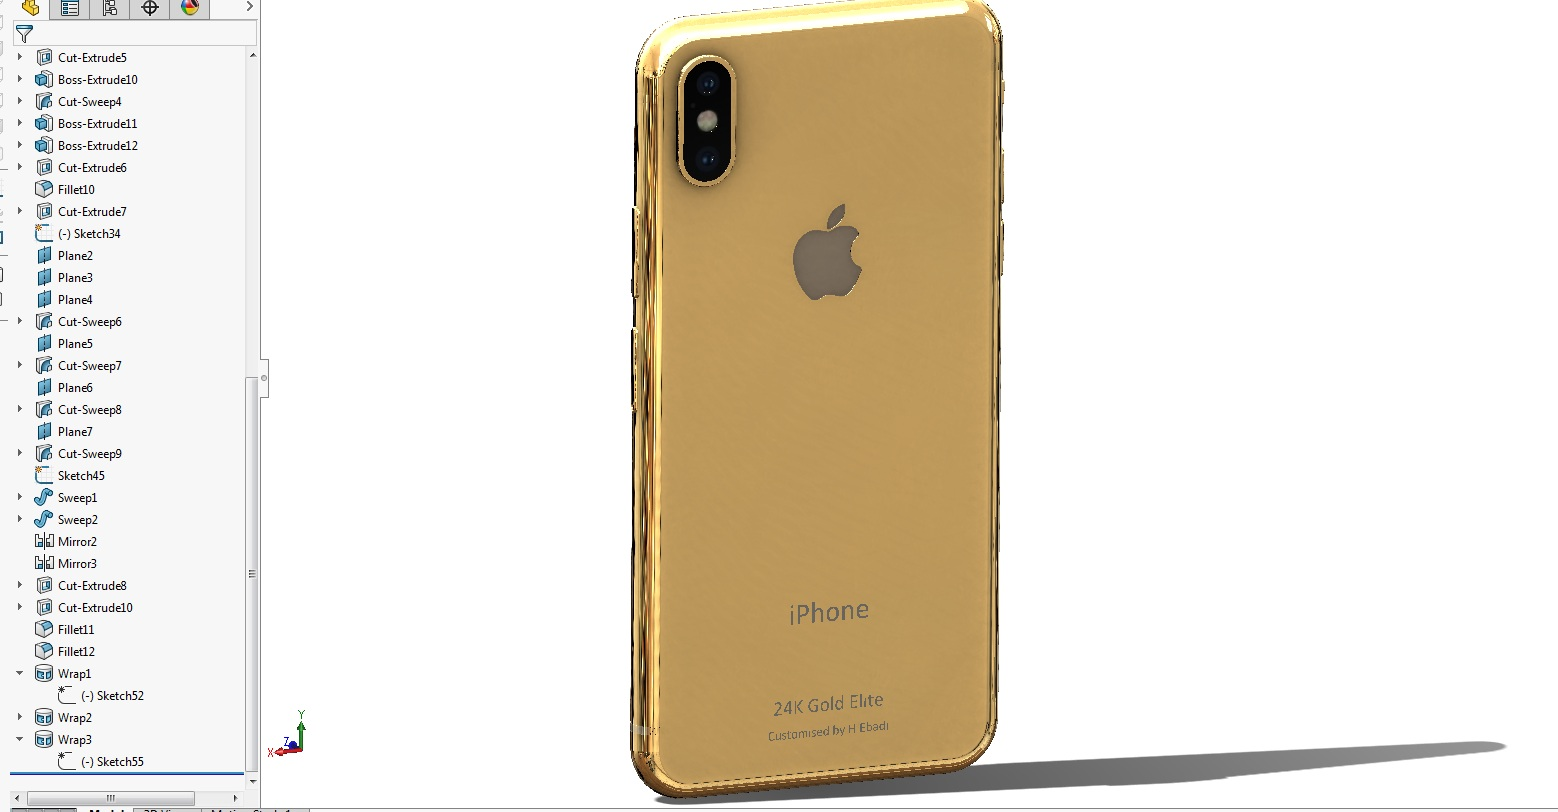 24K黄金版iPhone X简易模型3D图纸 STEP格式